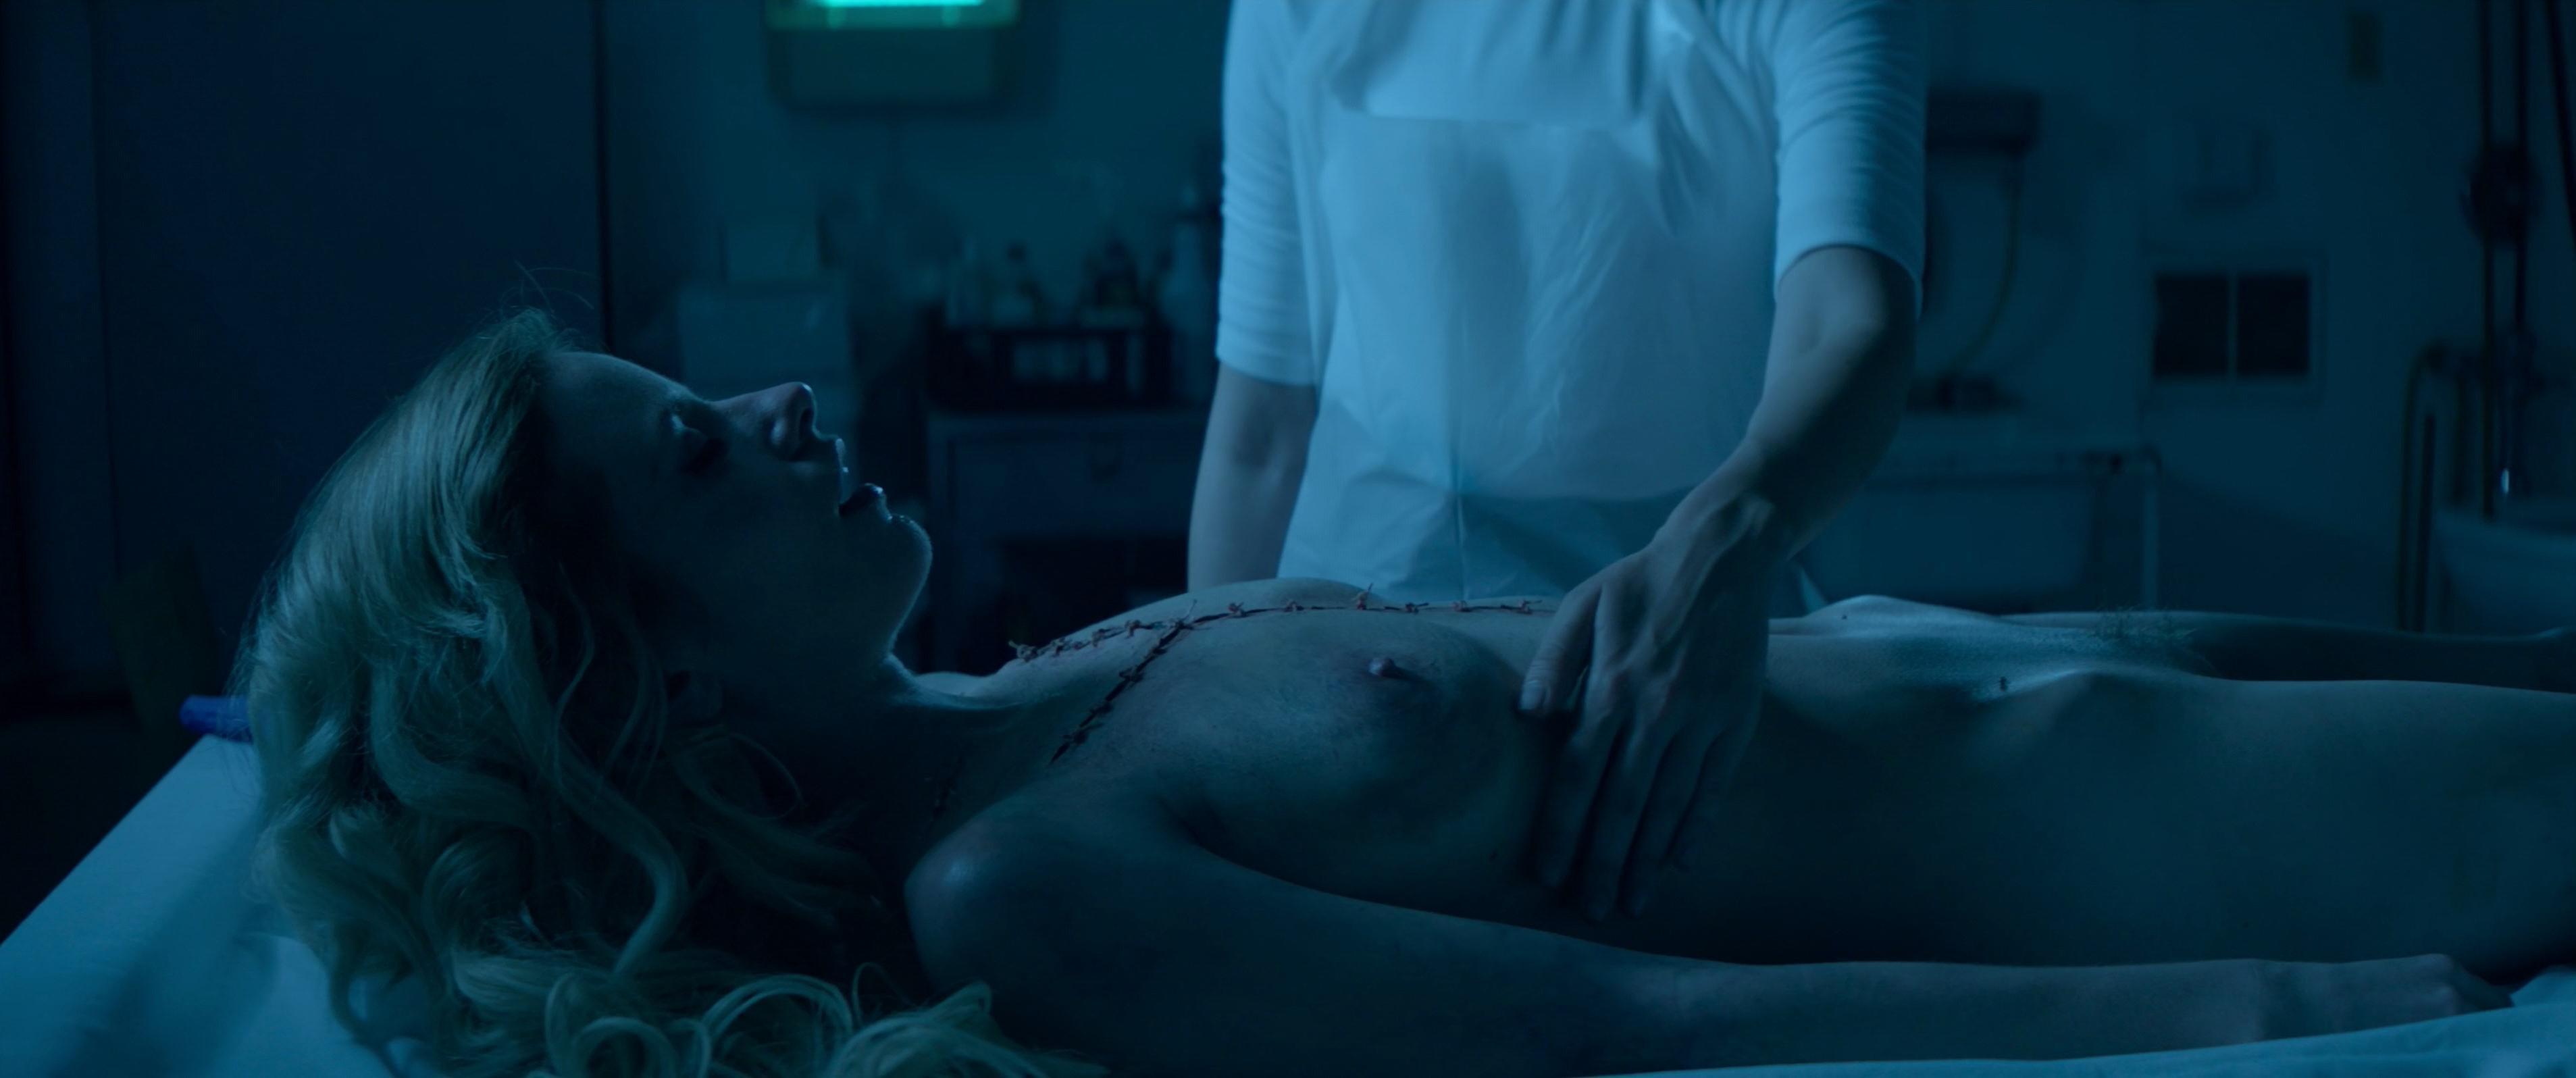 Cody Renee Cameron nude, Jena Malone sexy - The Neon Demon (2016)